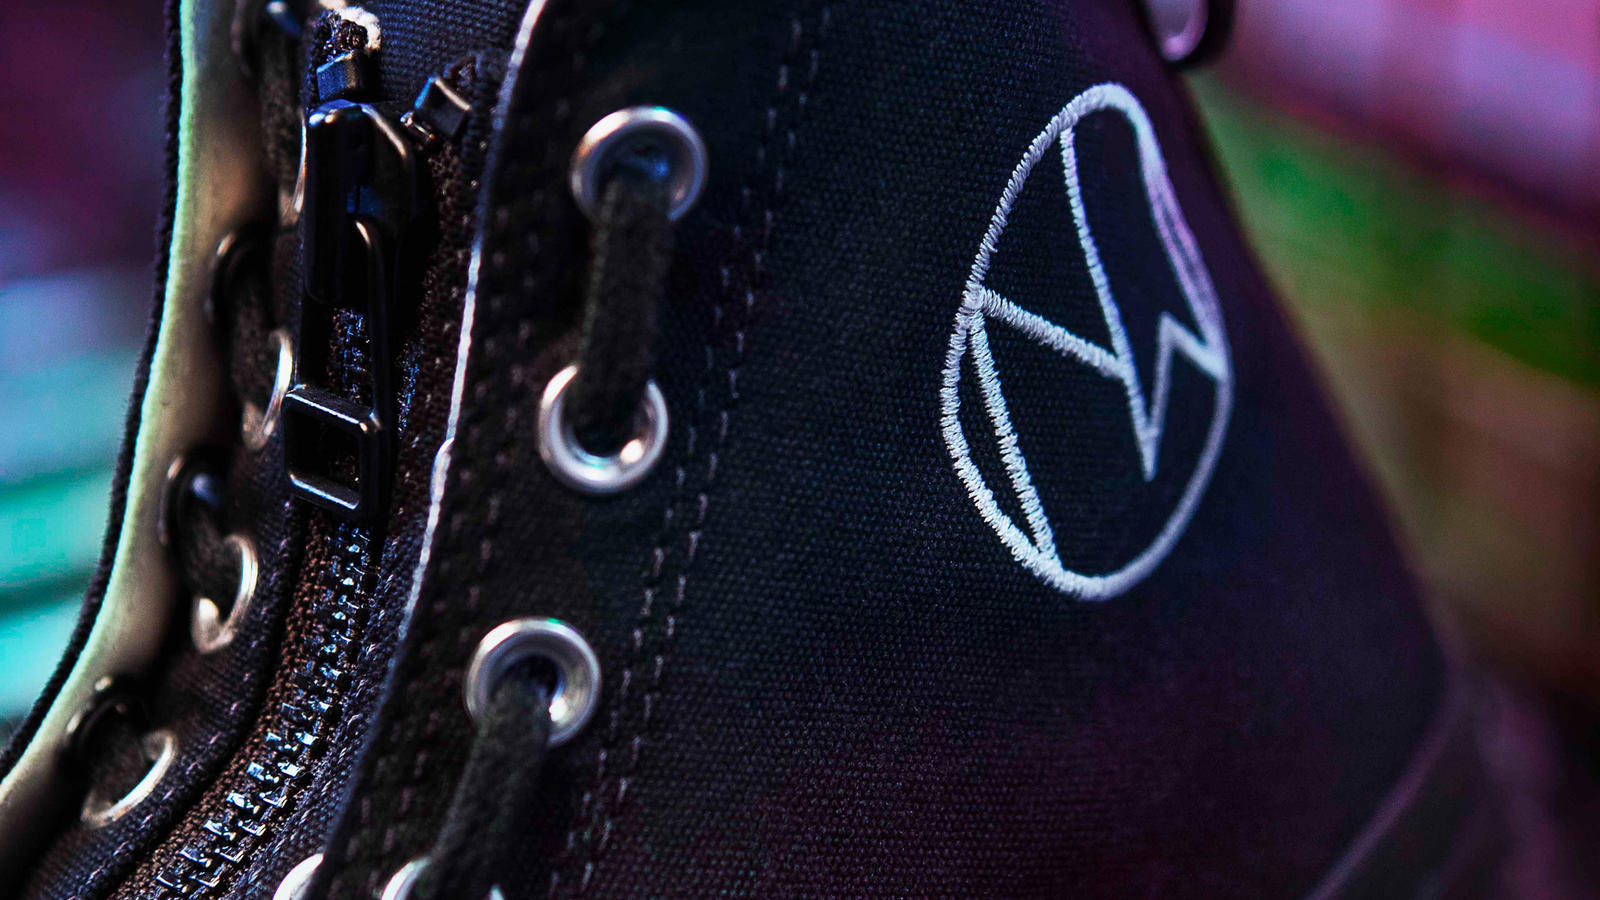 Converse Chuck 70 x Undercover 'Black' New Warriors